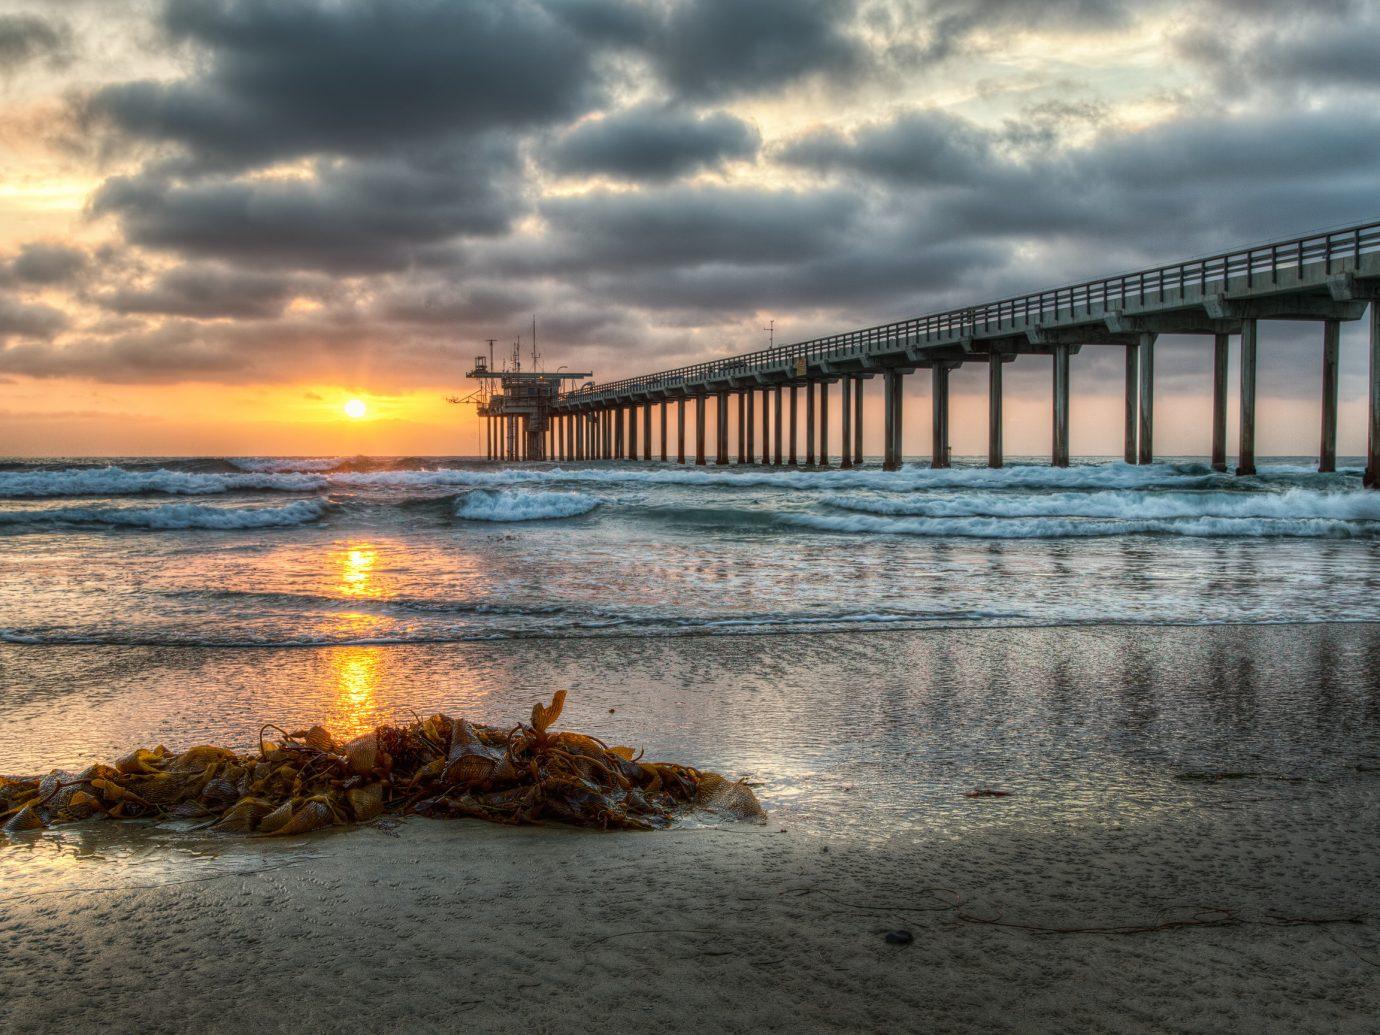 America Trip Ideas West Coast sky outdoor water pier shore Sea reflection scene horizon Beach Coast Ocean wave cloud Sunset sunrise morning dusk dawn evening sunlight sand bay clouds cloudy